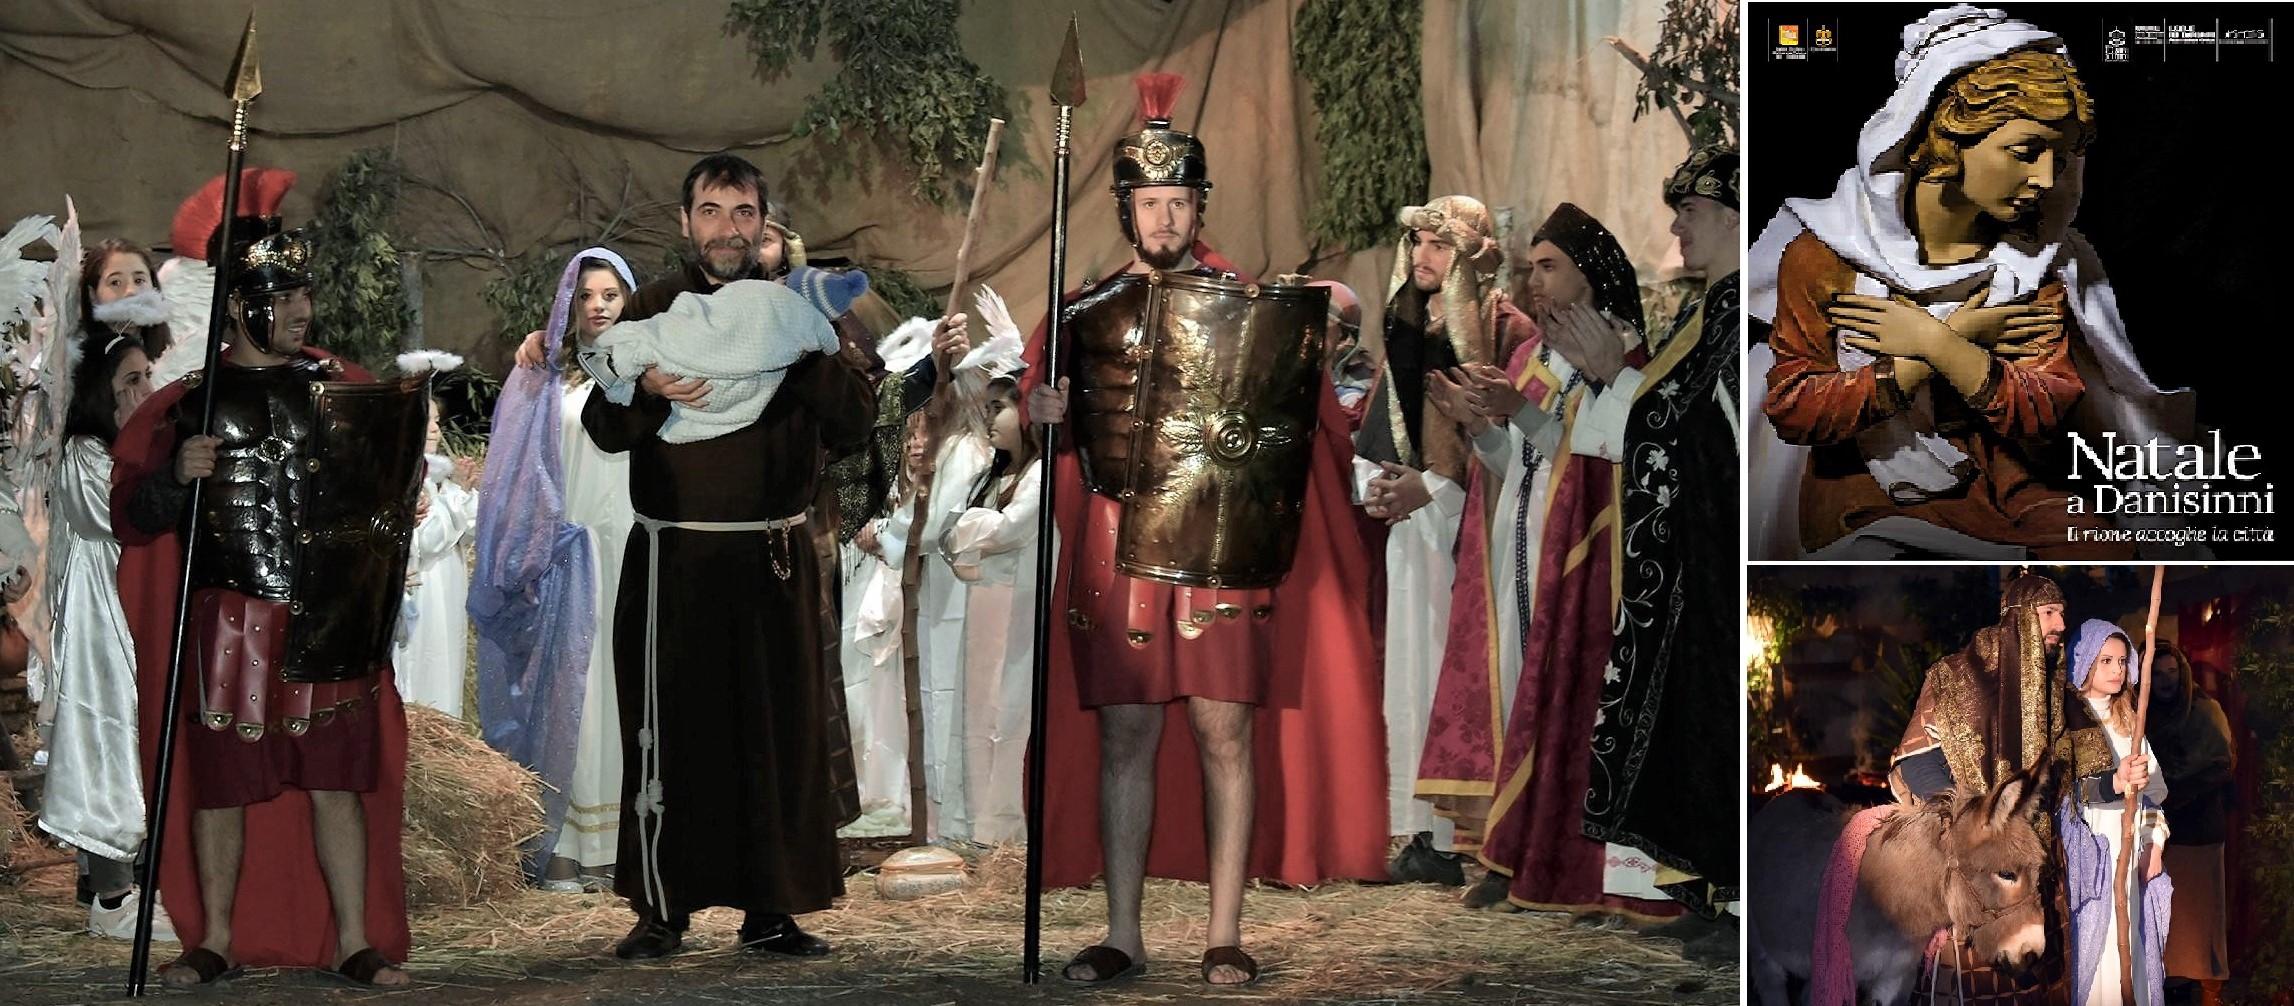 Natale a Danisinni, rinascita di un rione di Palermo